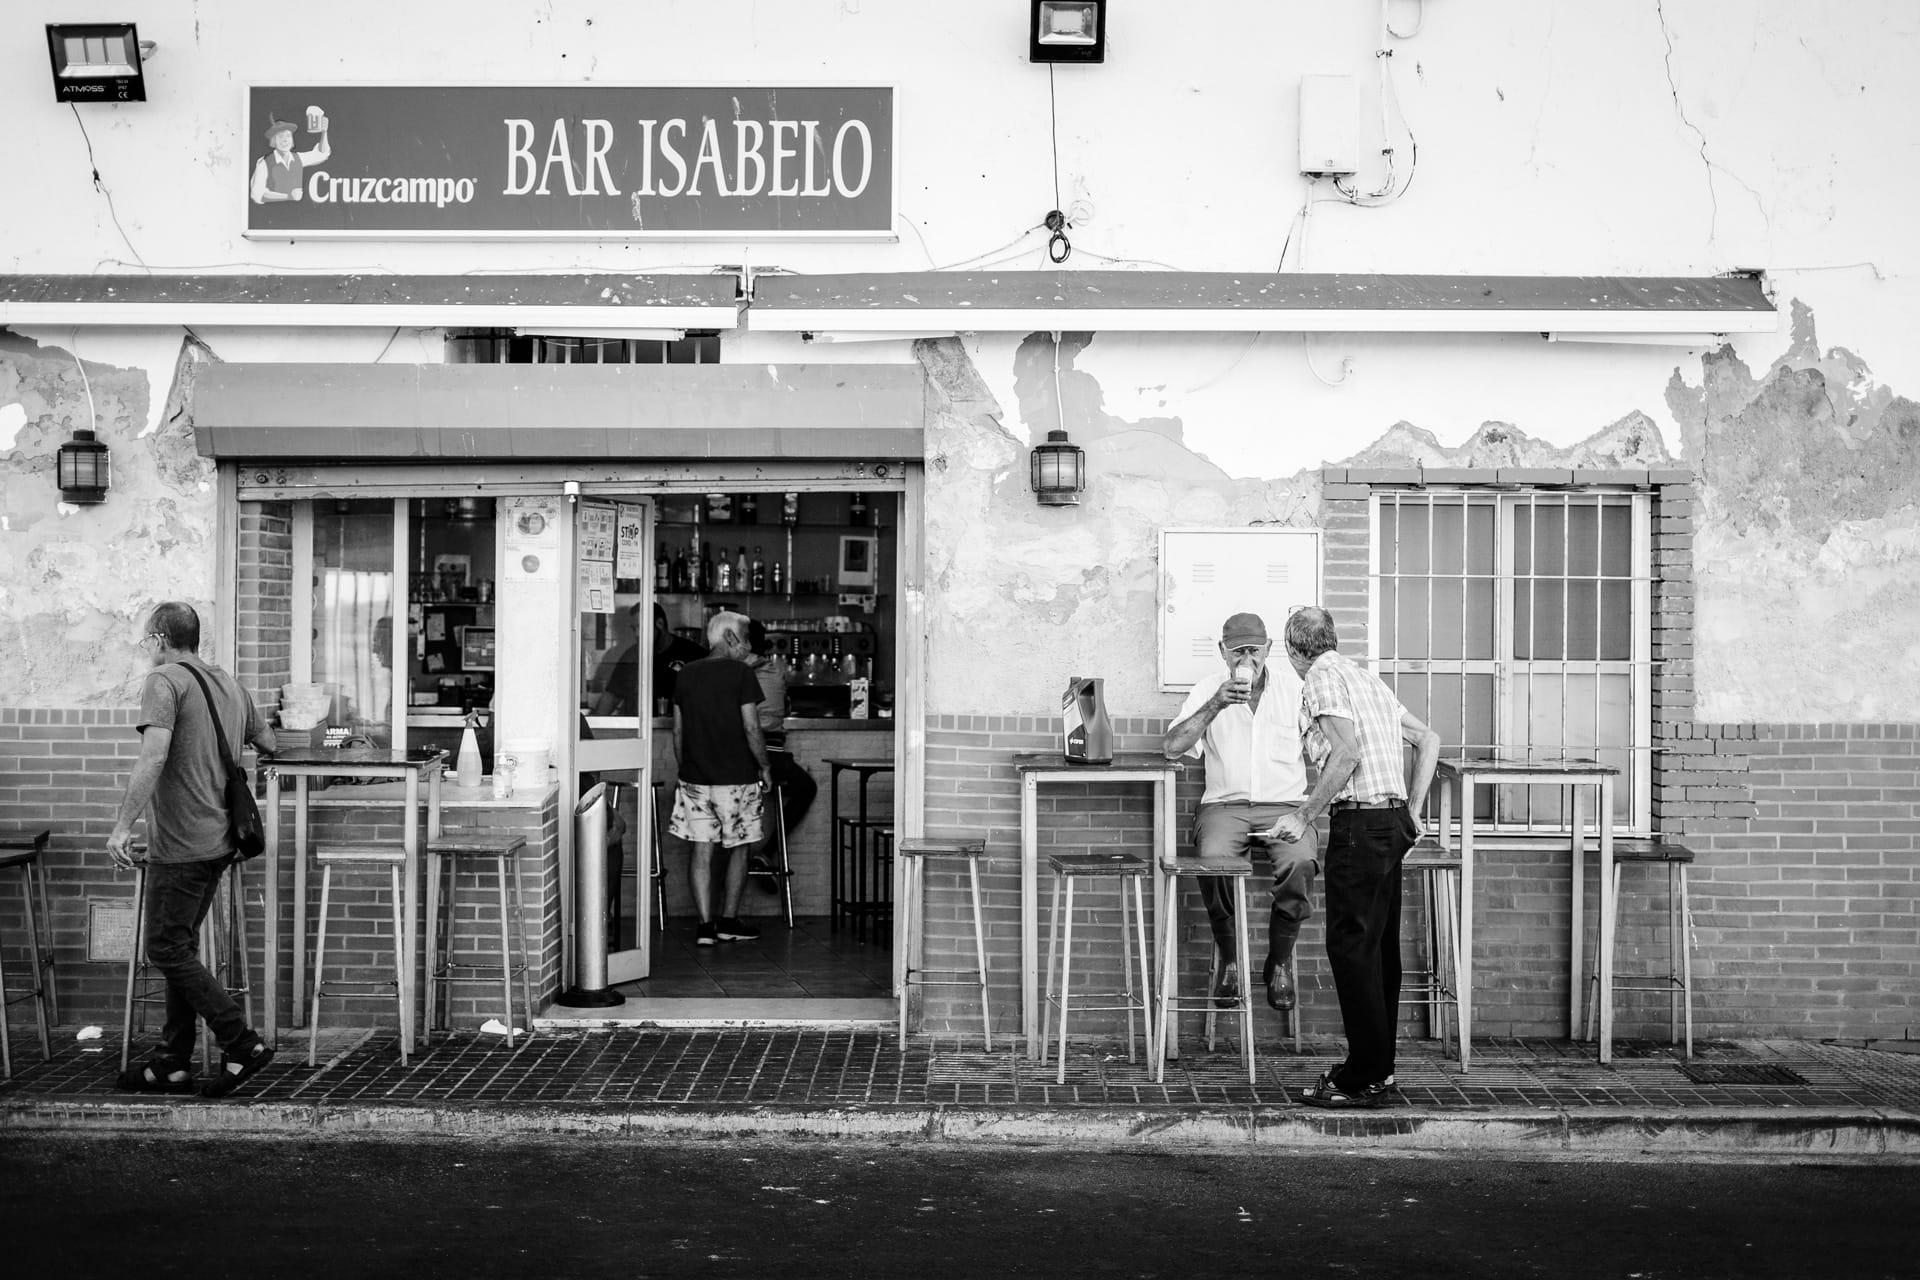 Bar Isabelo